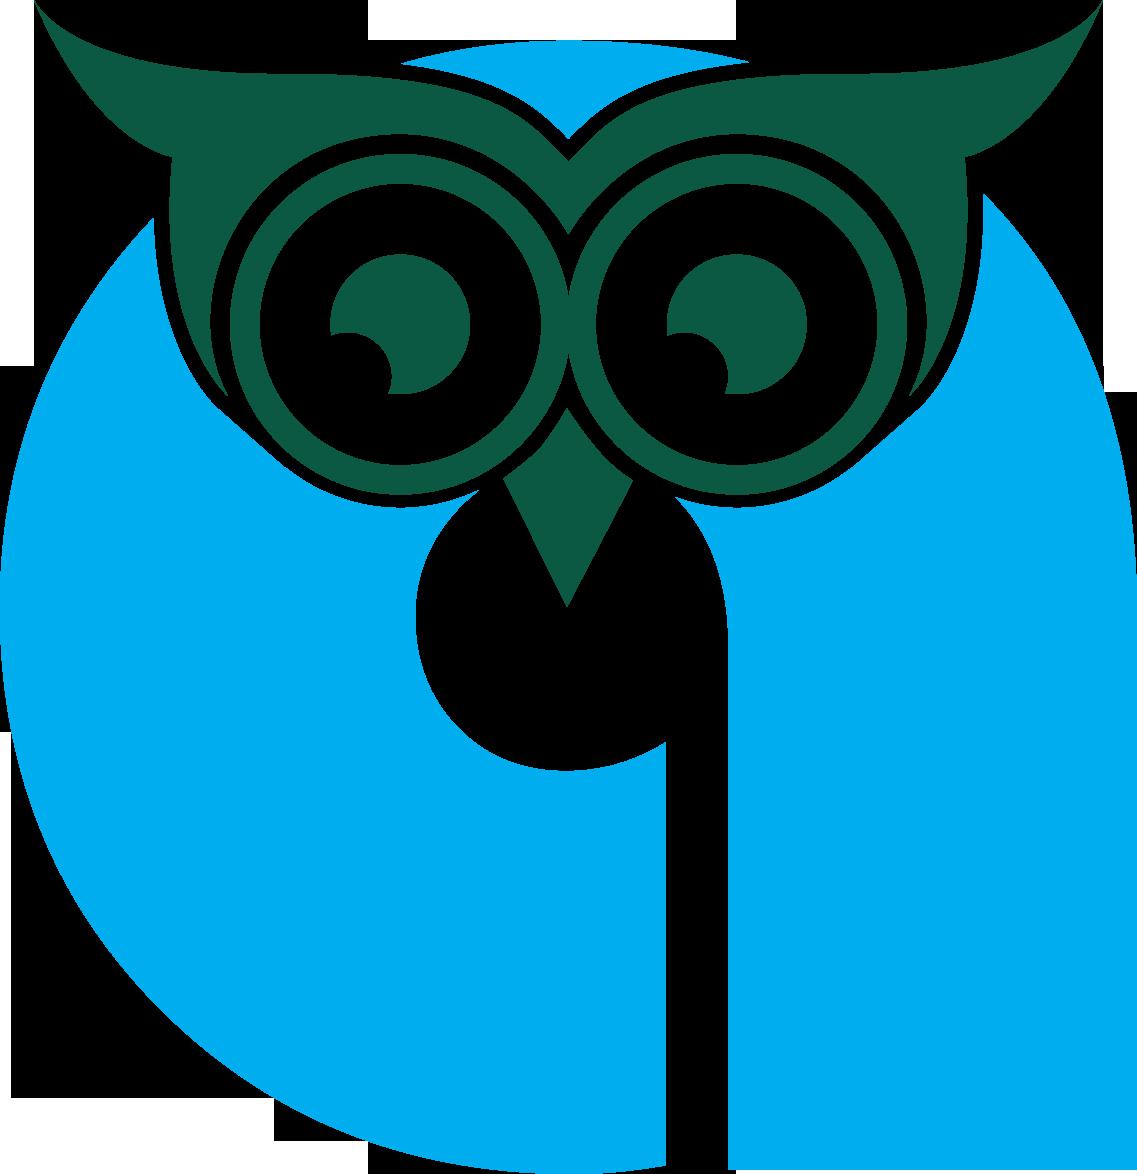 Sart logo